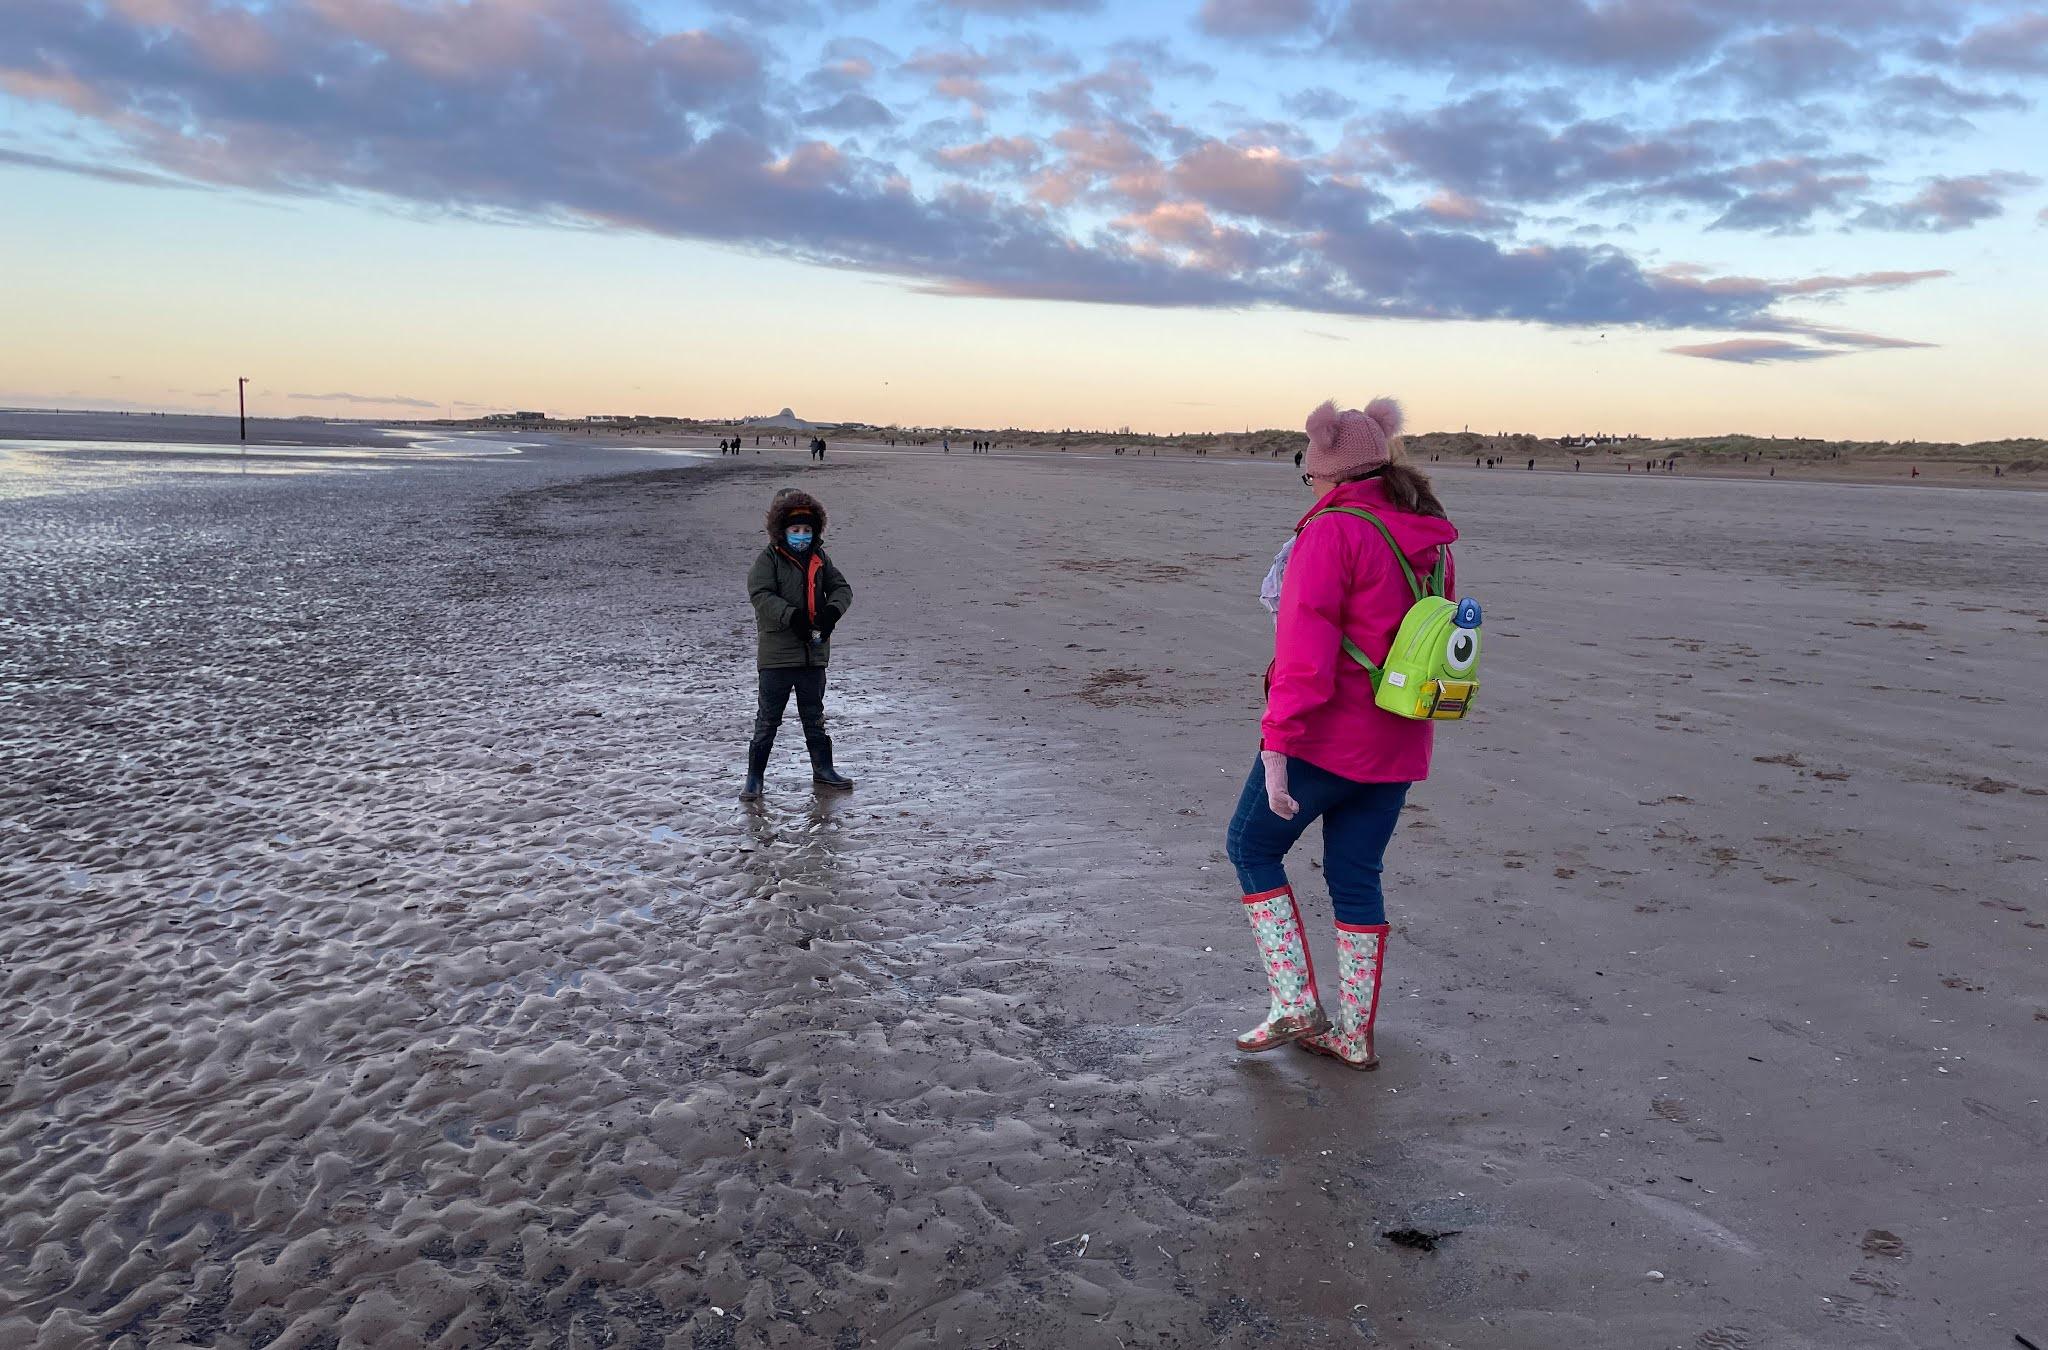 Woman and boy on beach